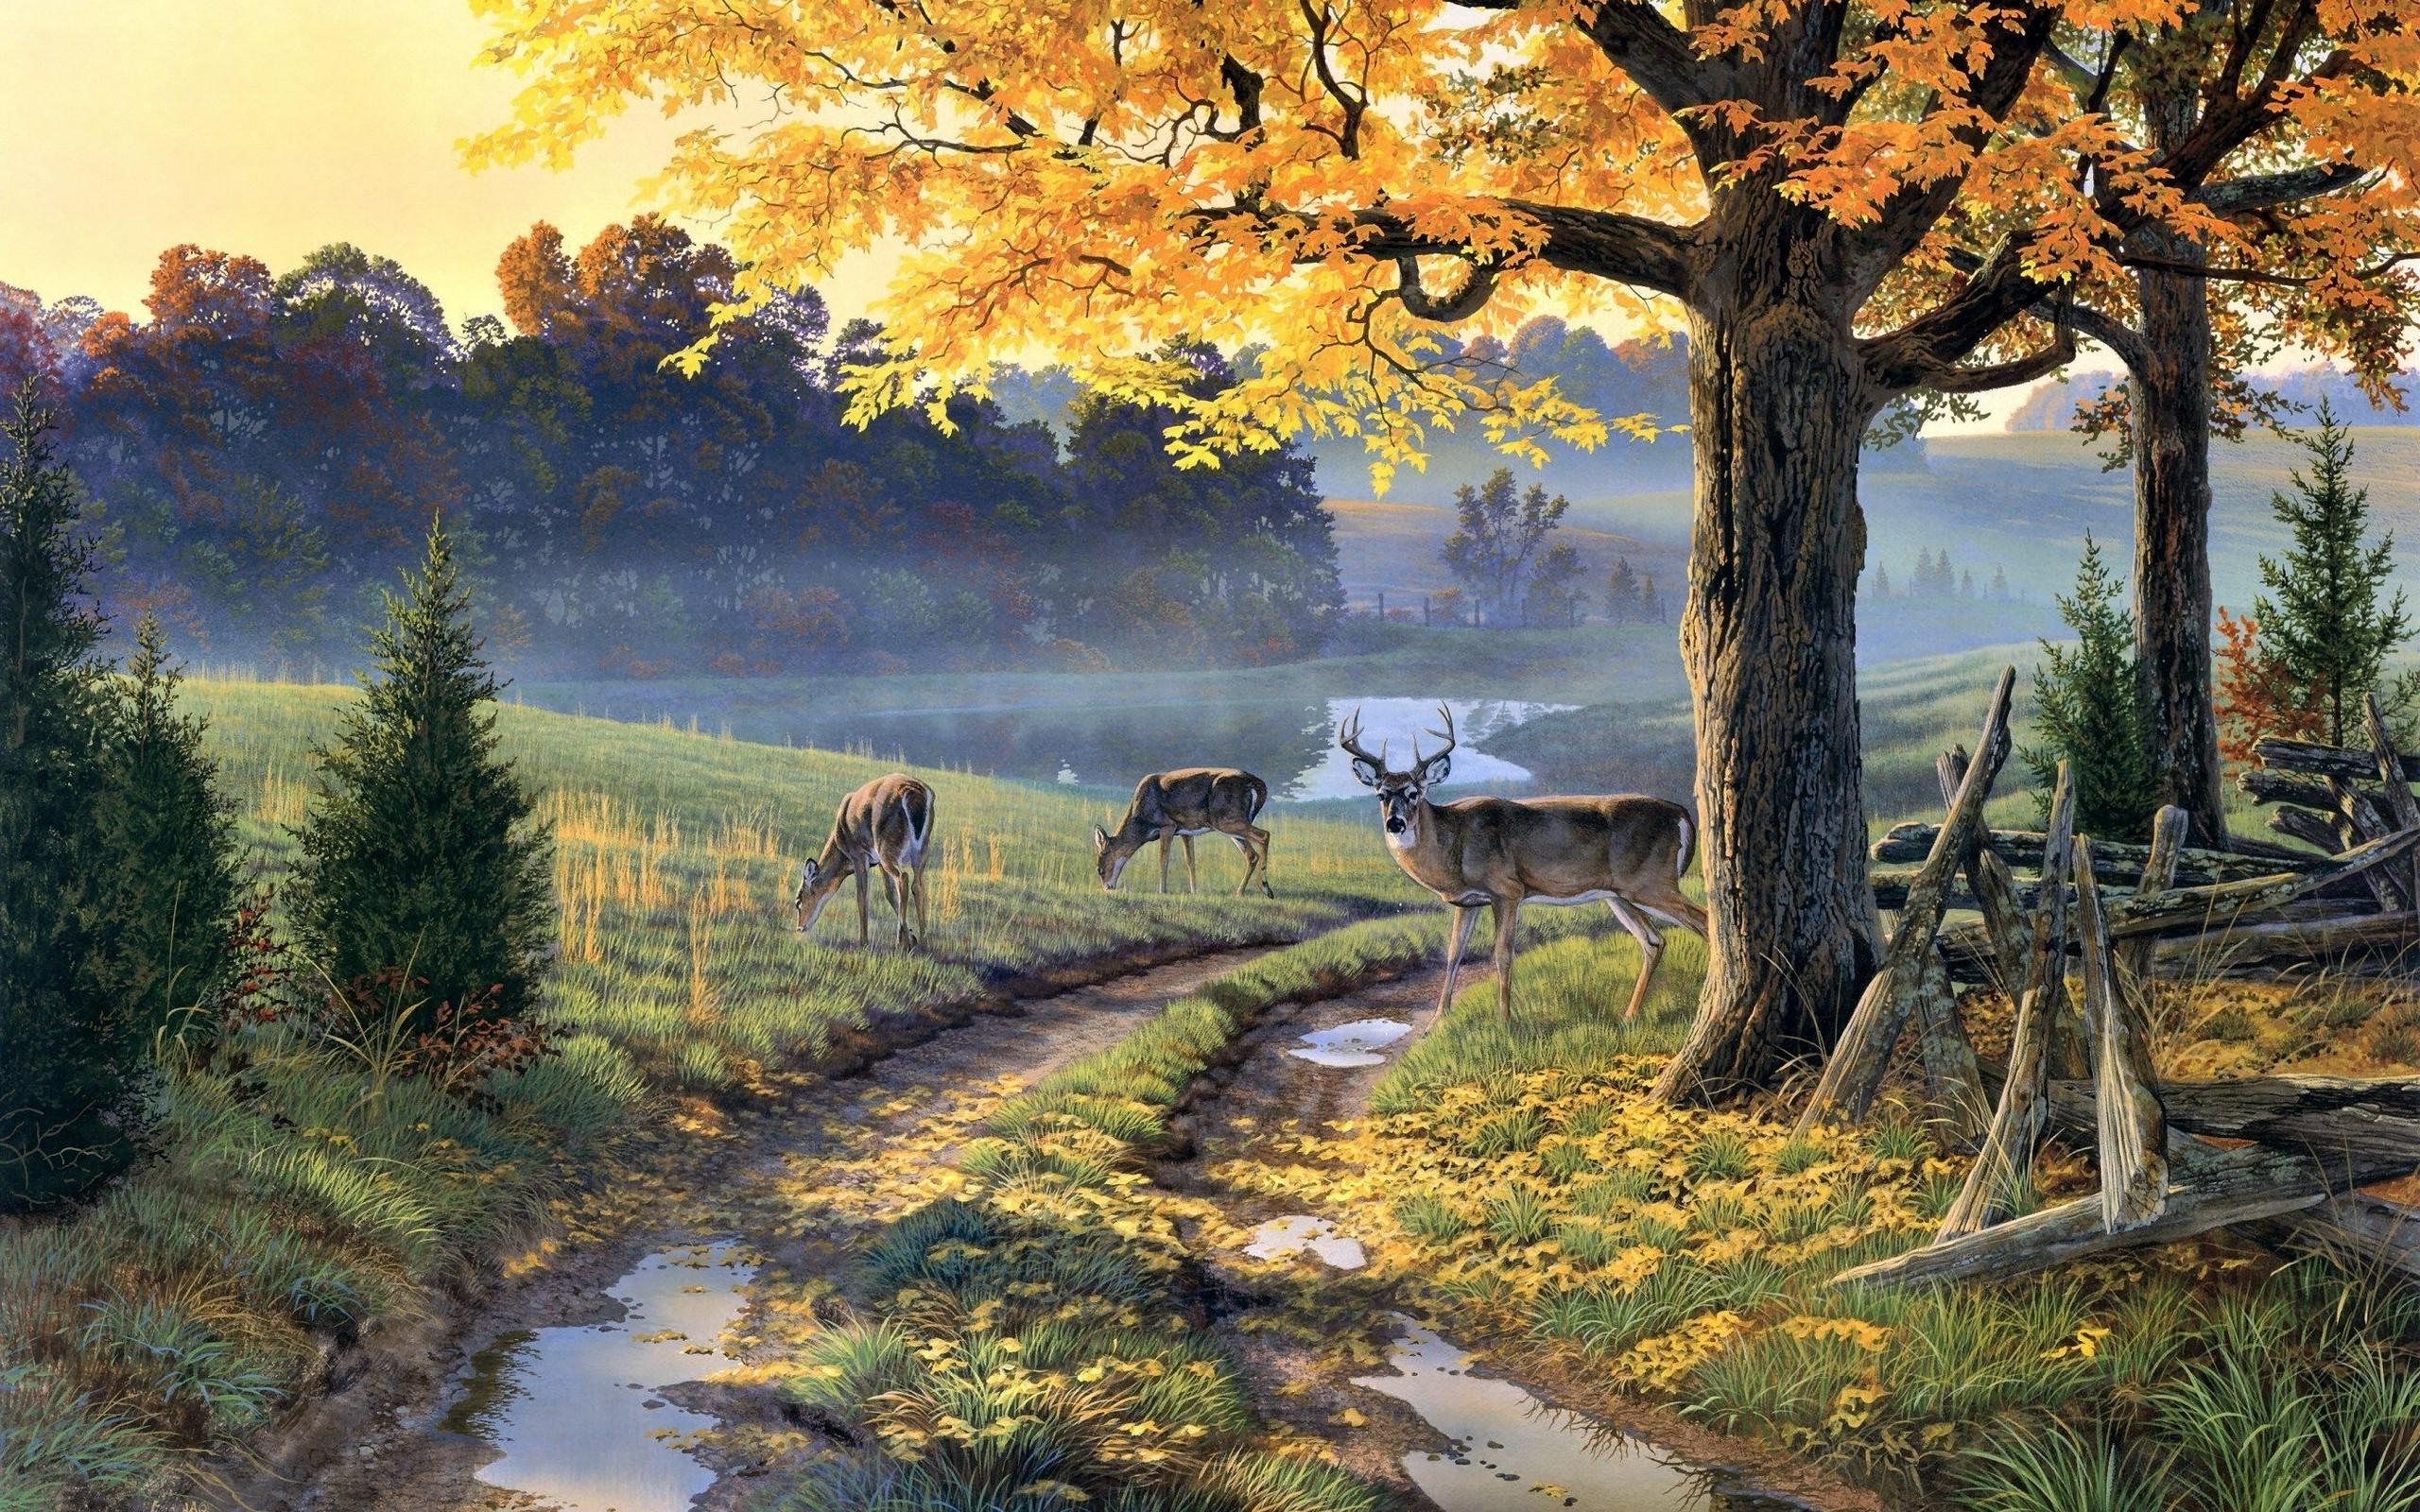 nature painting wallpaper,natural landscape,nature,painting,morning,landscape